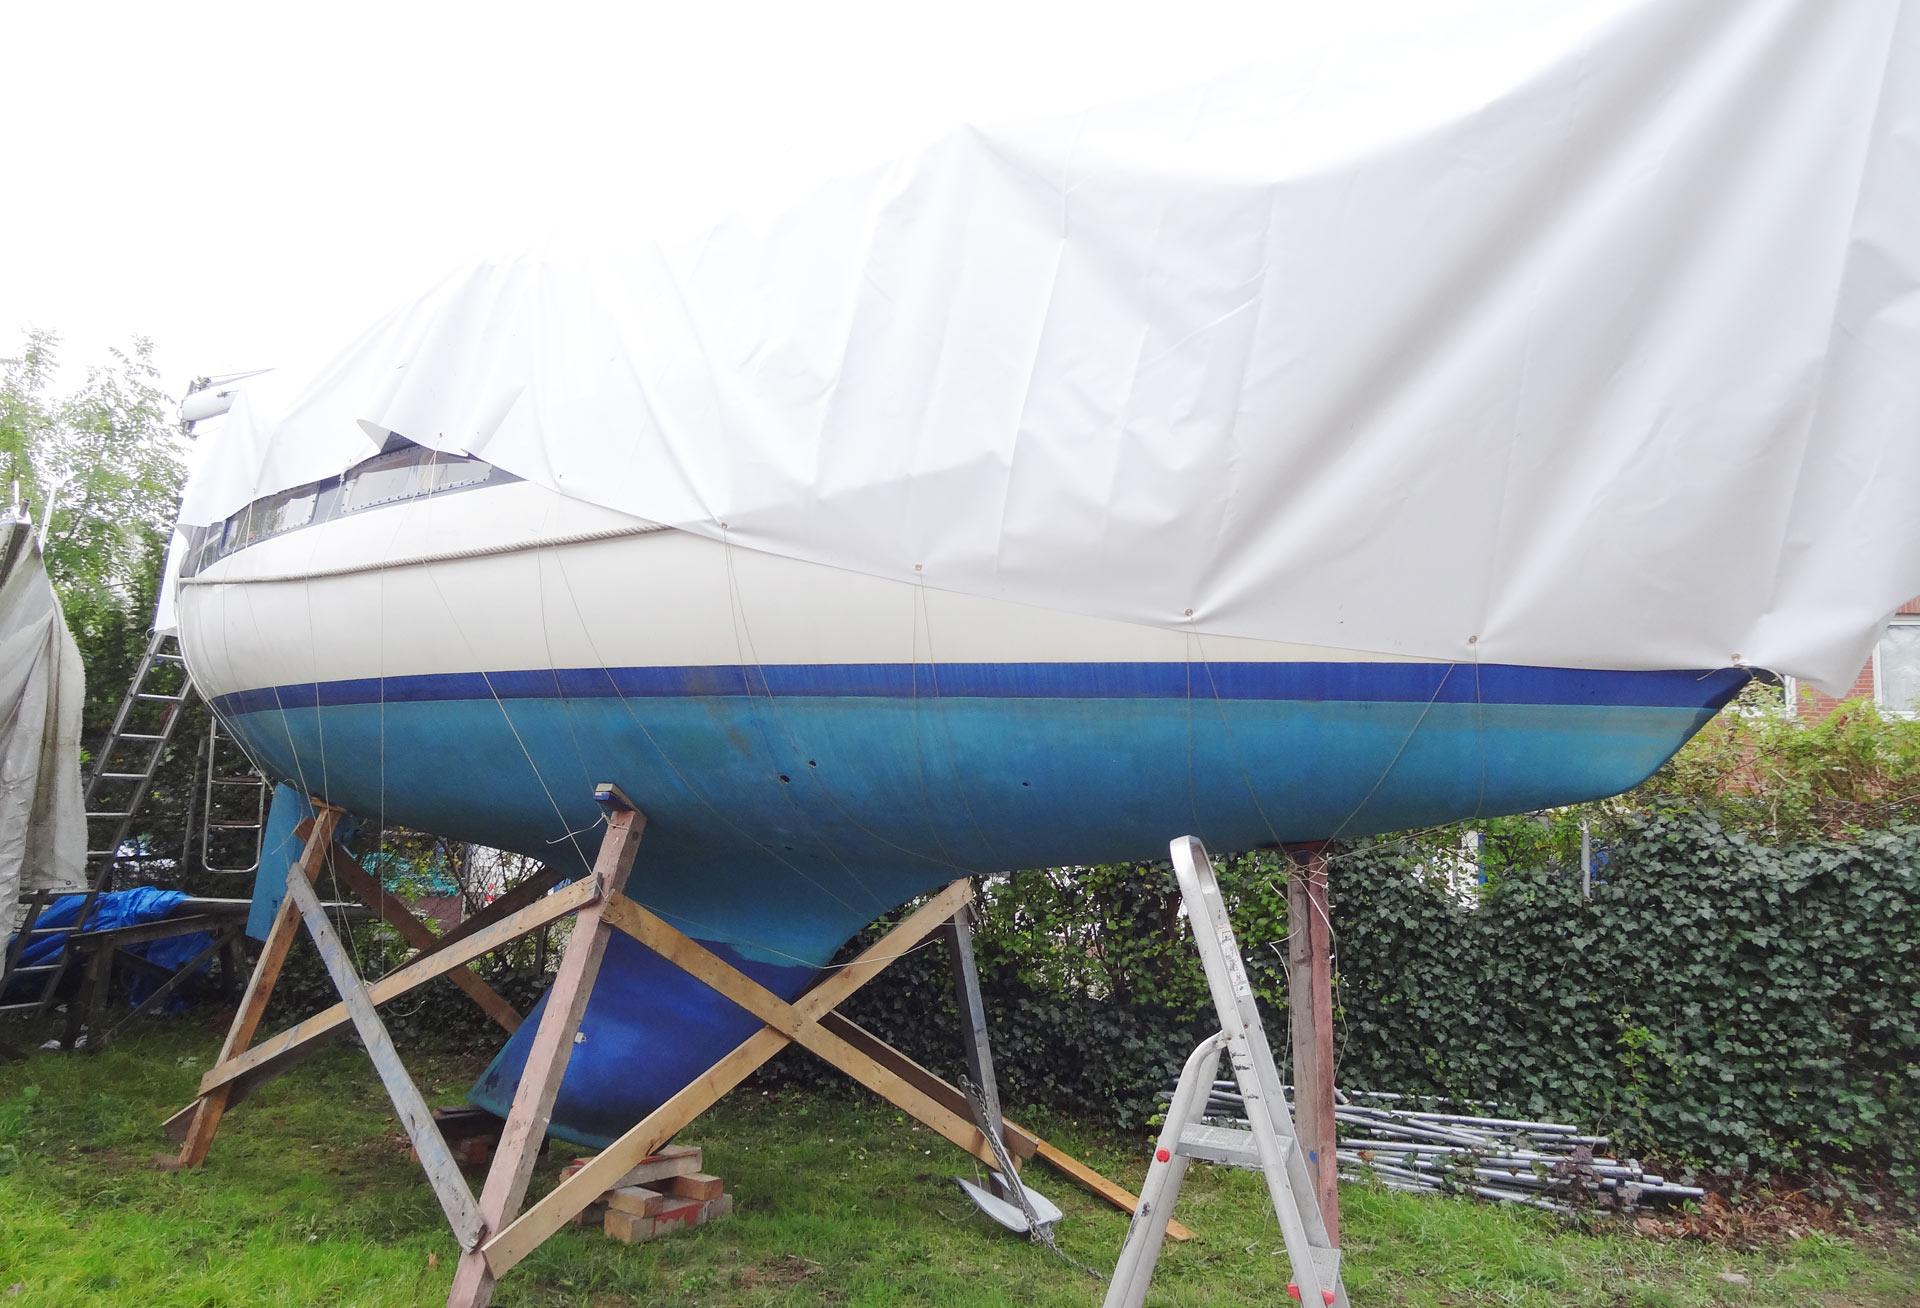 Finally: My yacht under her new tarp on land.